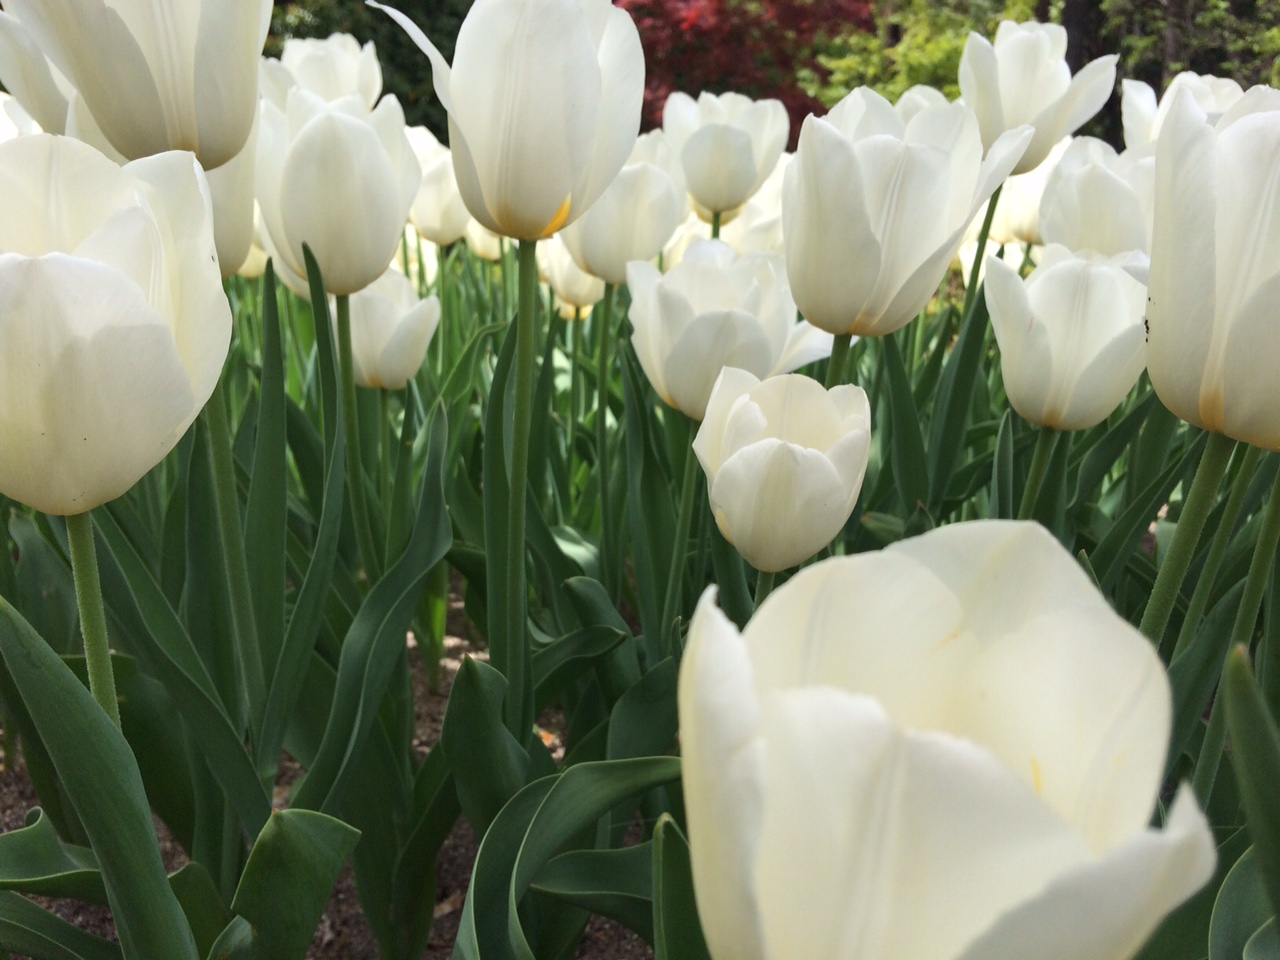 Jardín botánico de Madrid en primavera